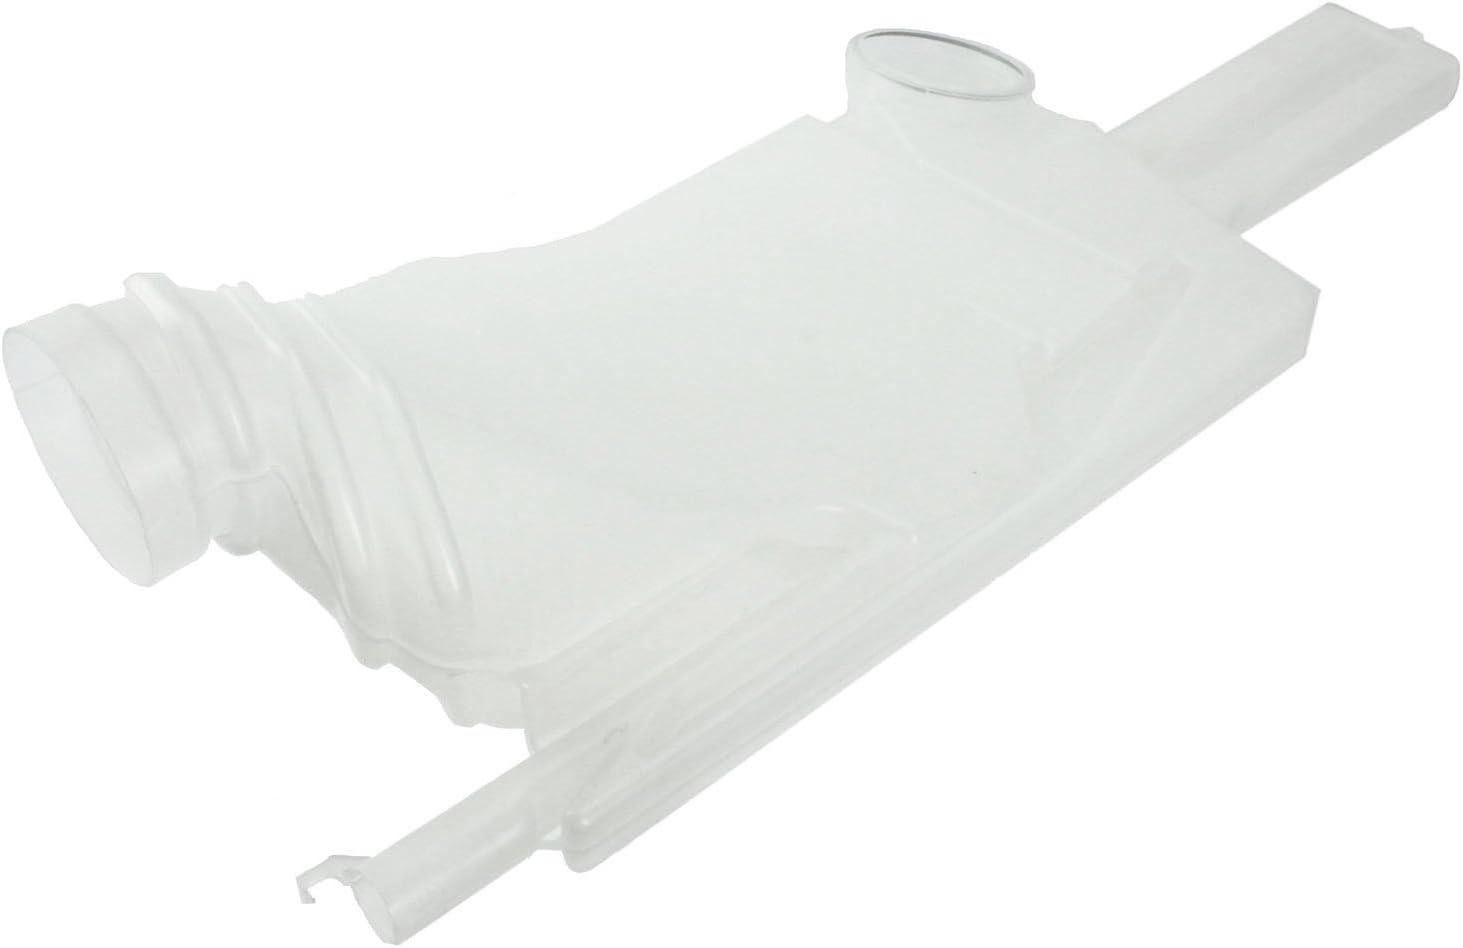 Zanussi lavadora-secadora plástico condensador de vapor